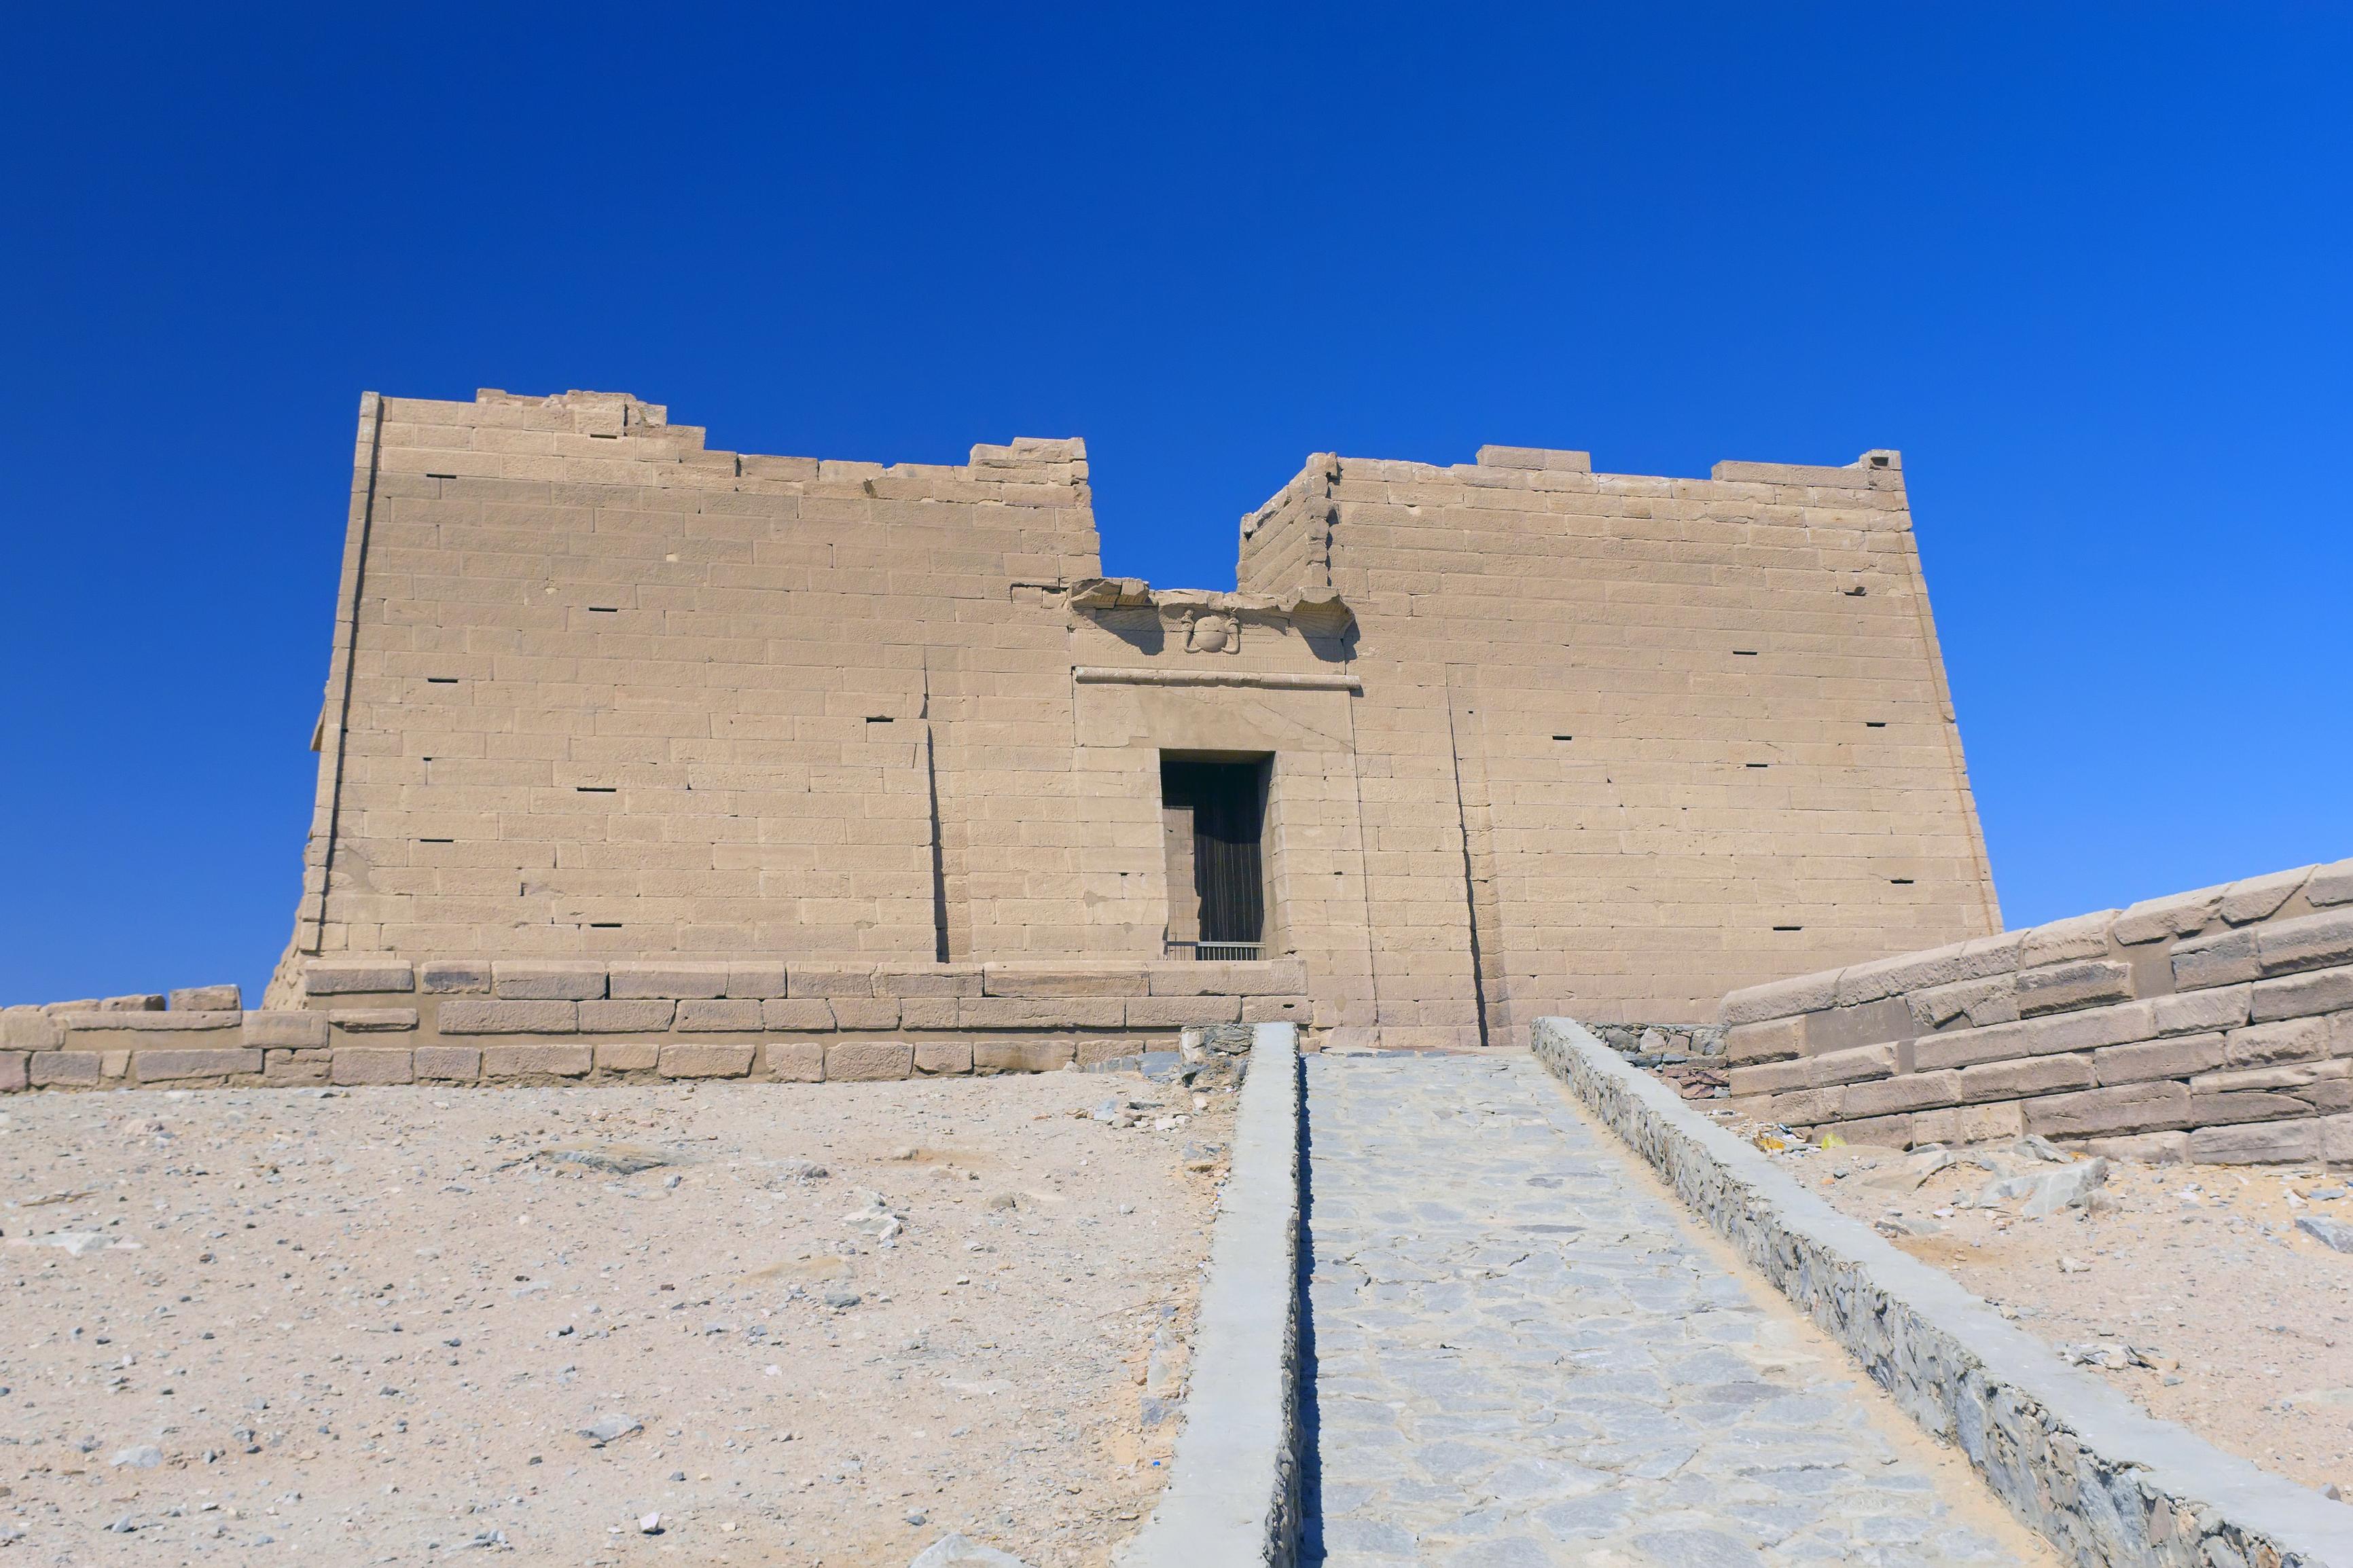 Mandulis (Kalabsha) Temple, near Aswan, Egypt